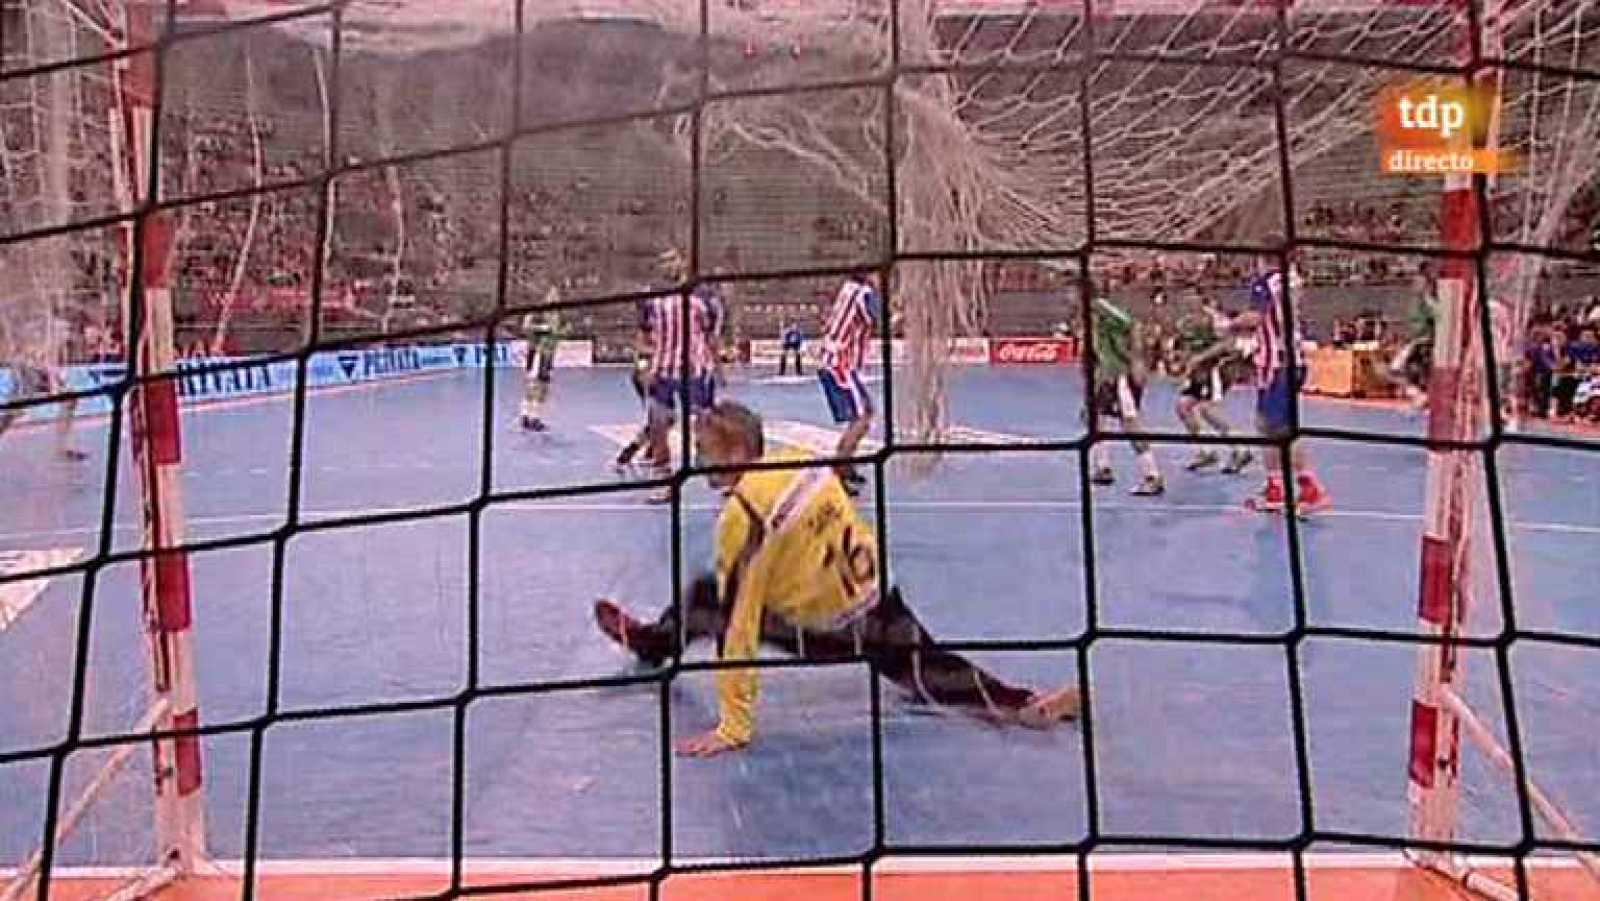 Balonmano - Liga ASOBAL. 3ª jornada - BM Atlético Madrid-Helvetia Anaitasuna - Ver ahora